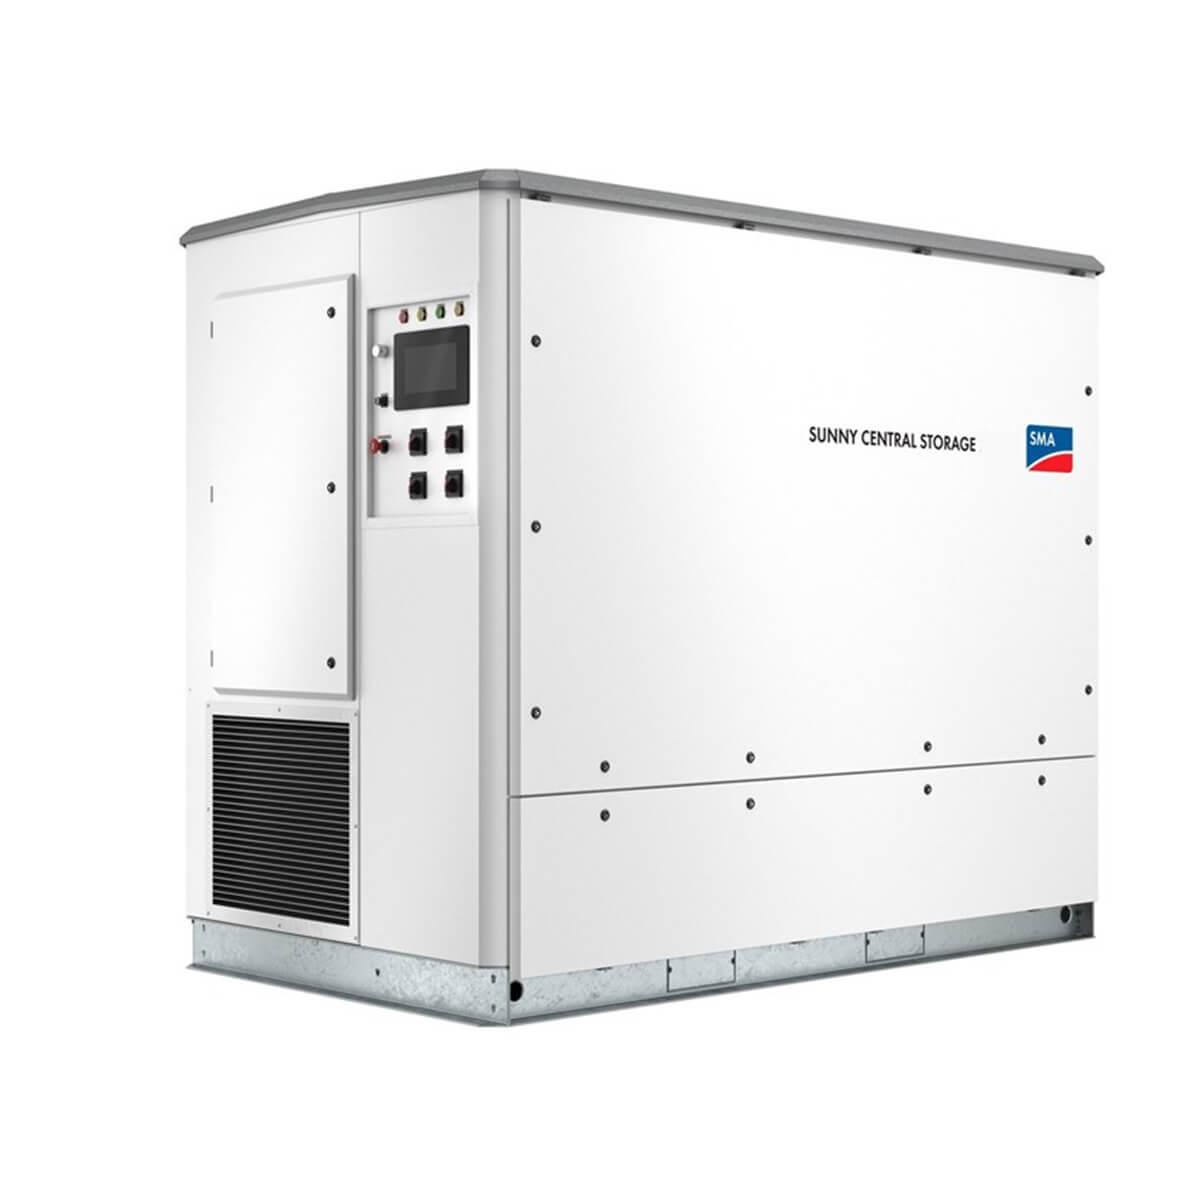 sma 2750kW inverter, sma sunny central 2750kW inverter, sma sunny central 2750-ev inverter, sma sunny central 2750-ev, sma sunny central 2750 kW, SMA 2750KW